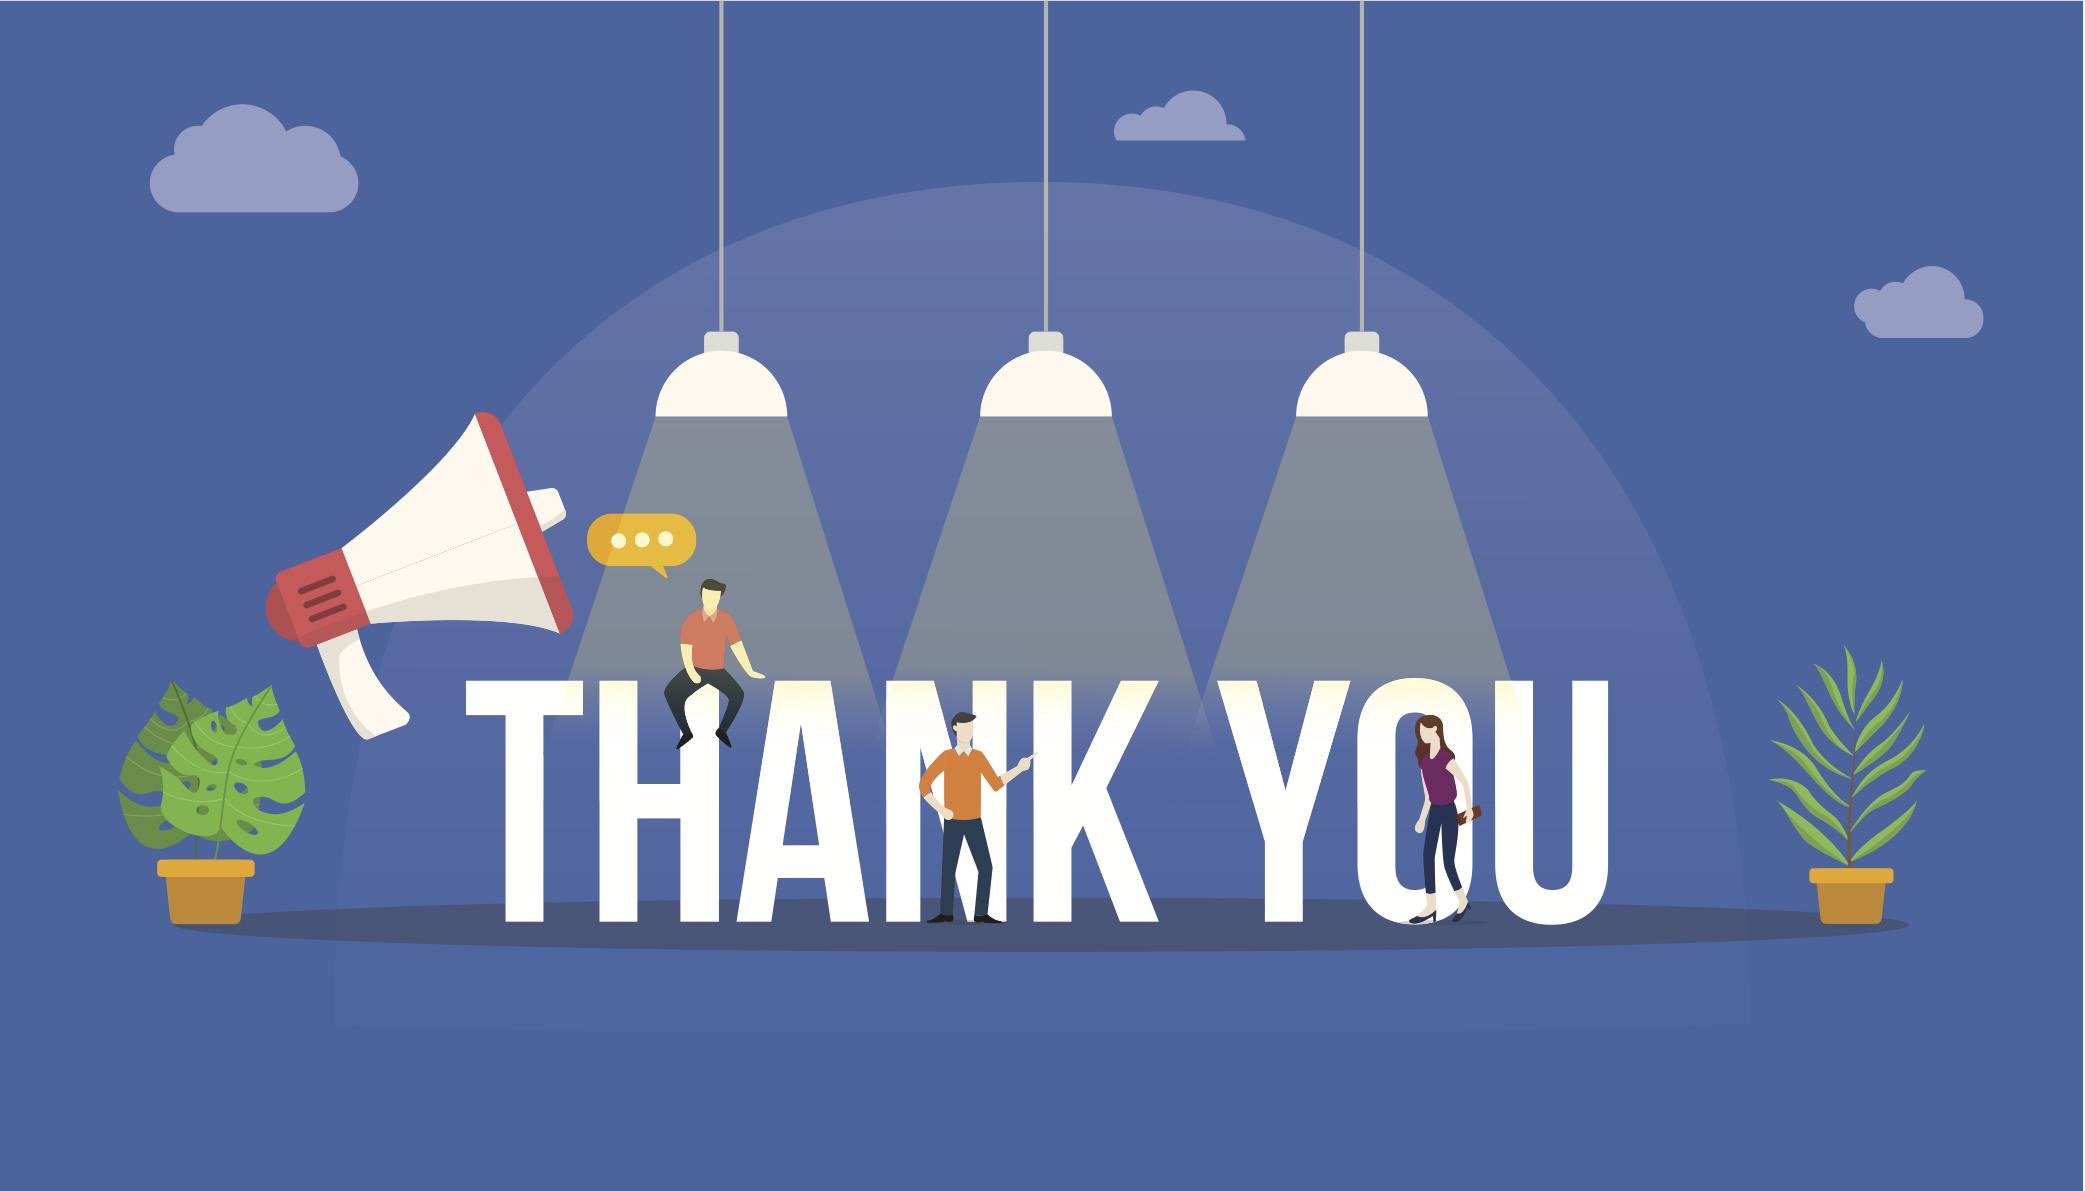 Thank you megaphone.png